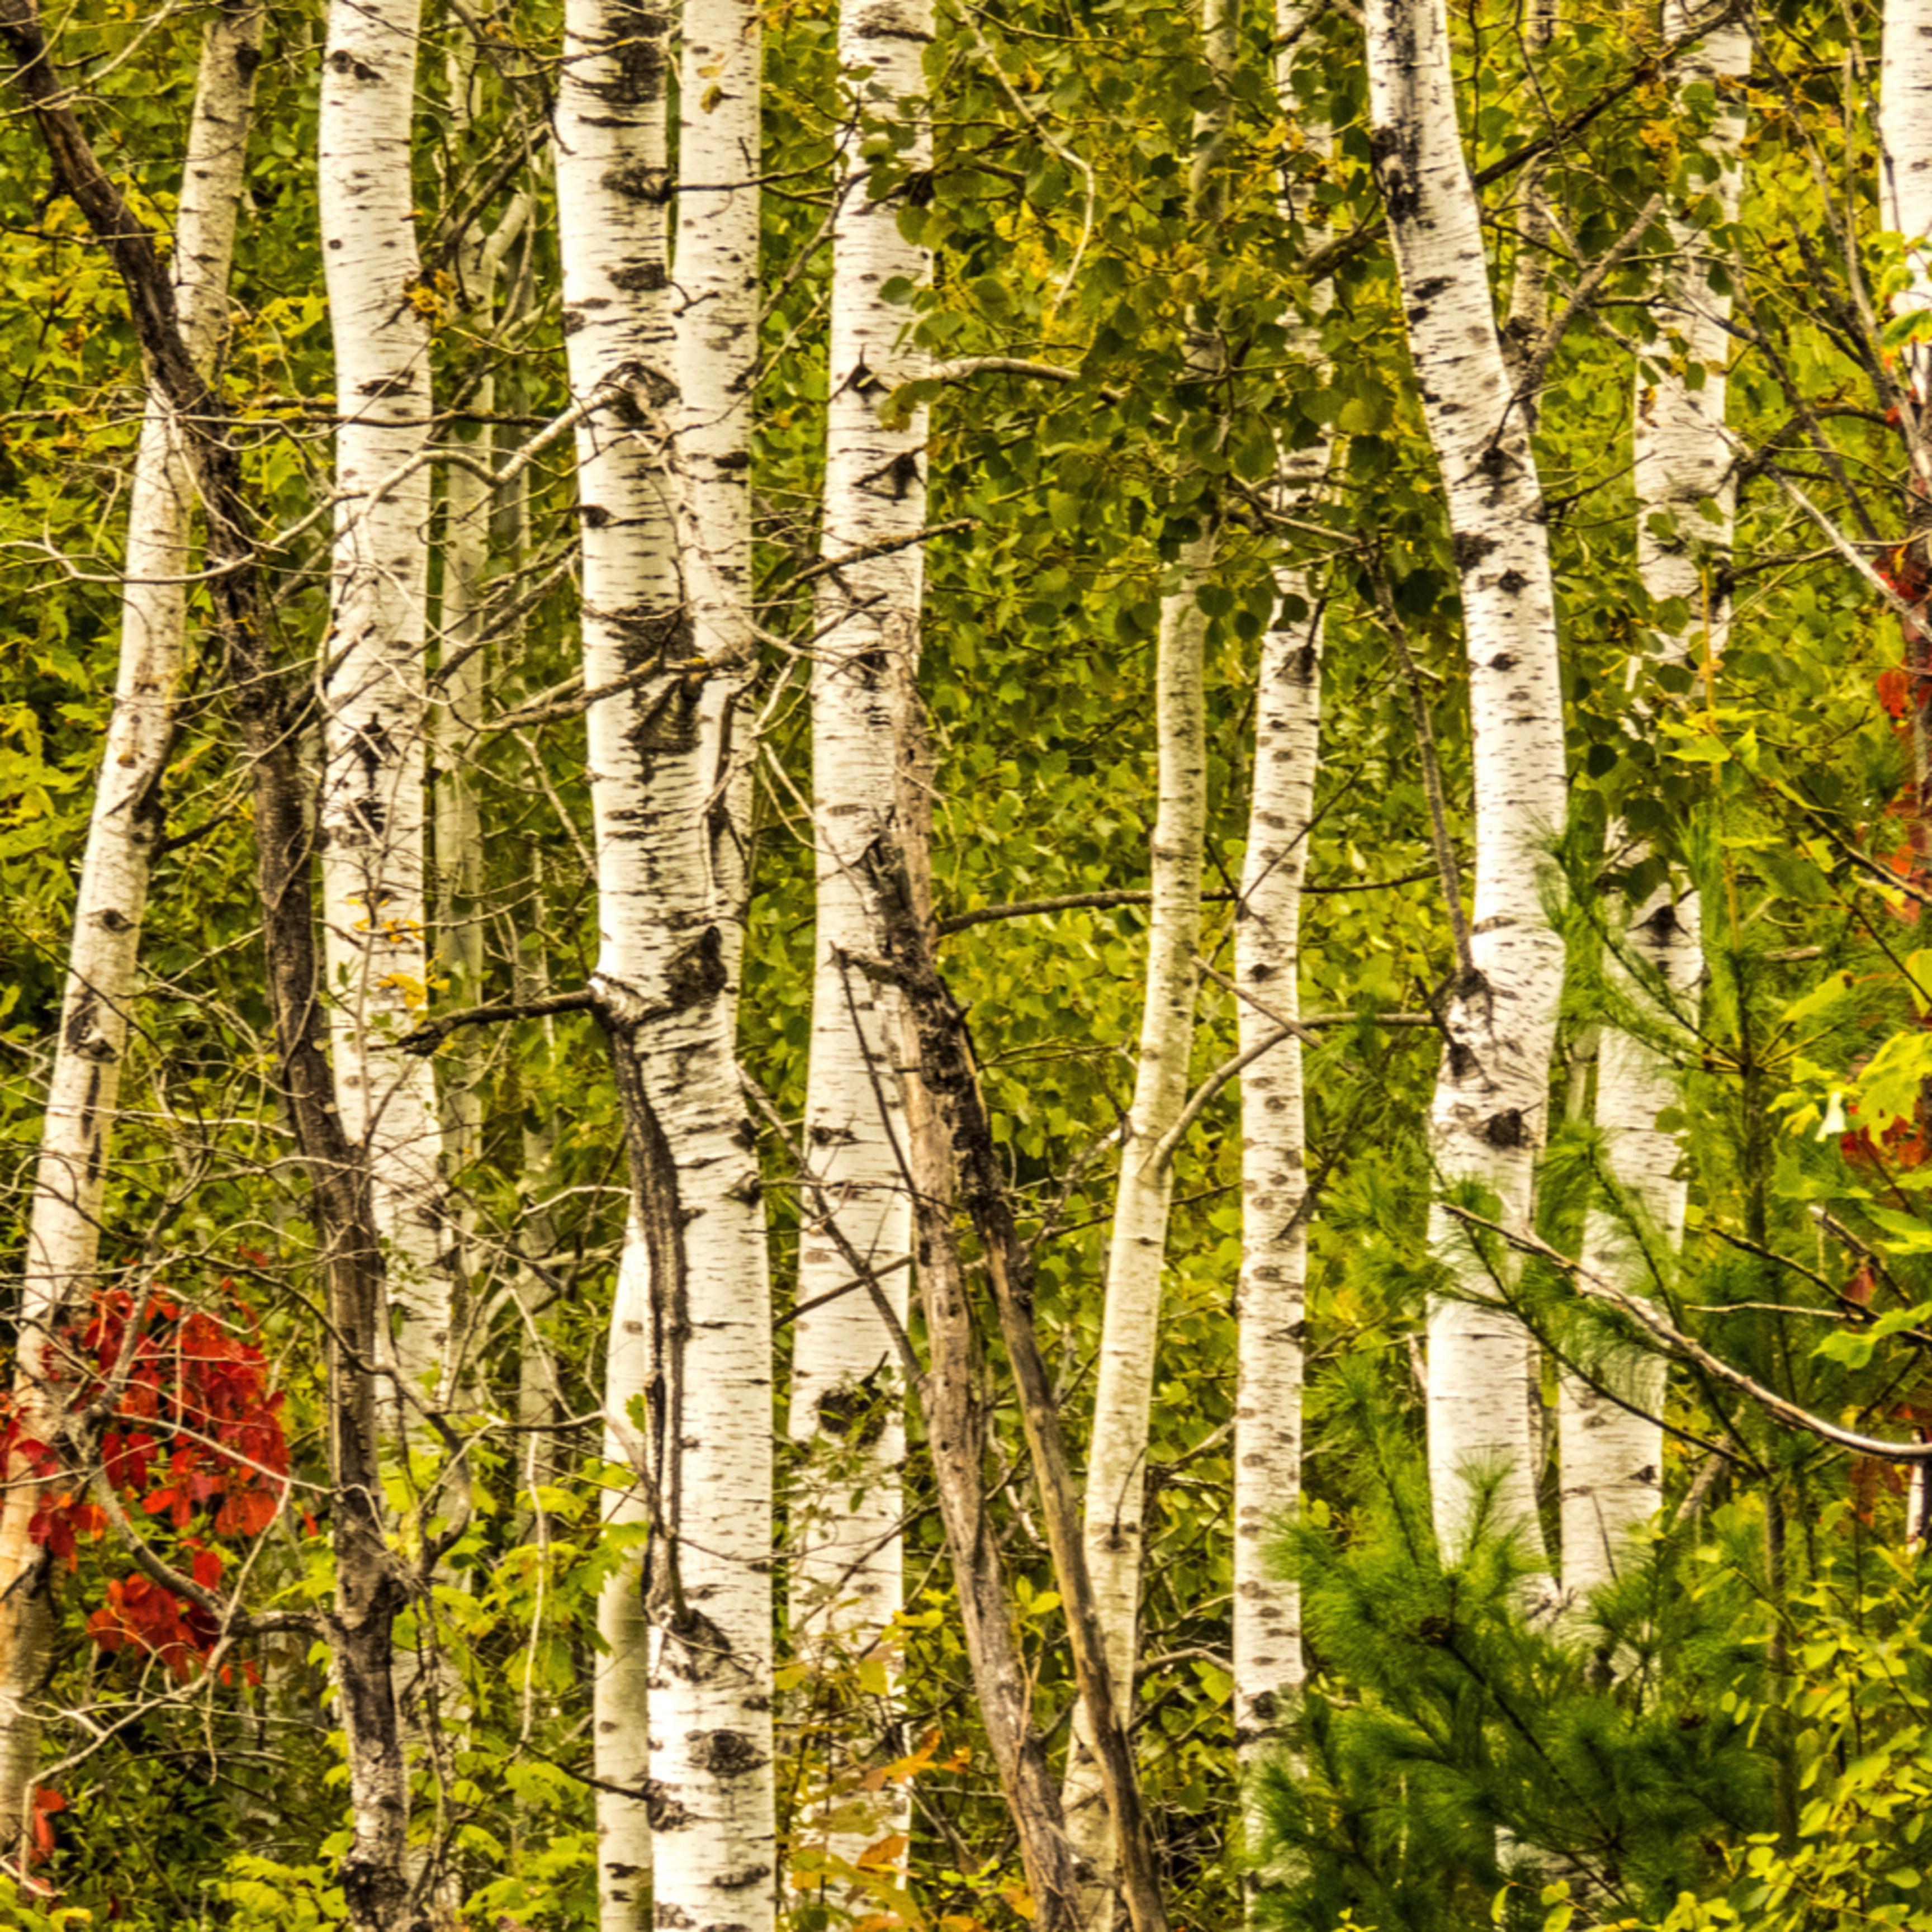 Birch trees snzyte